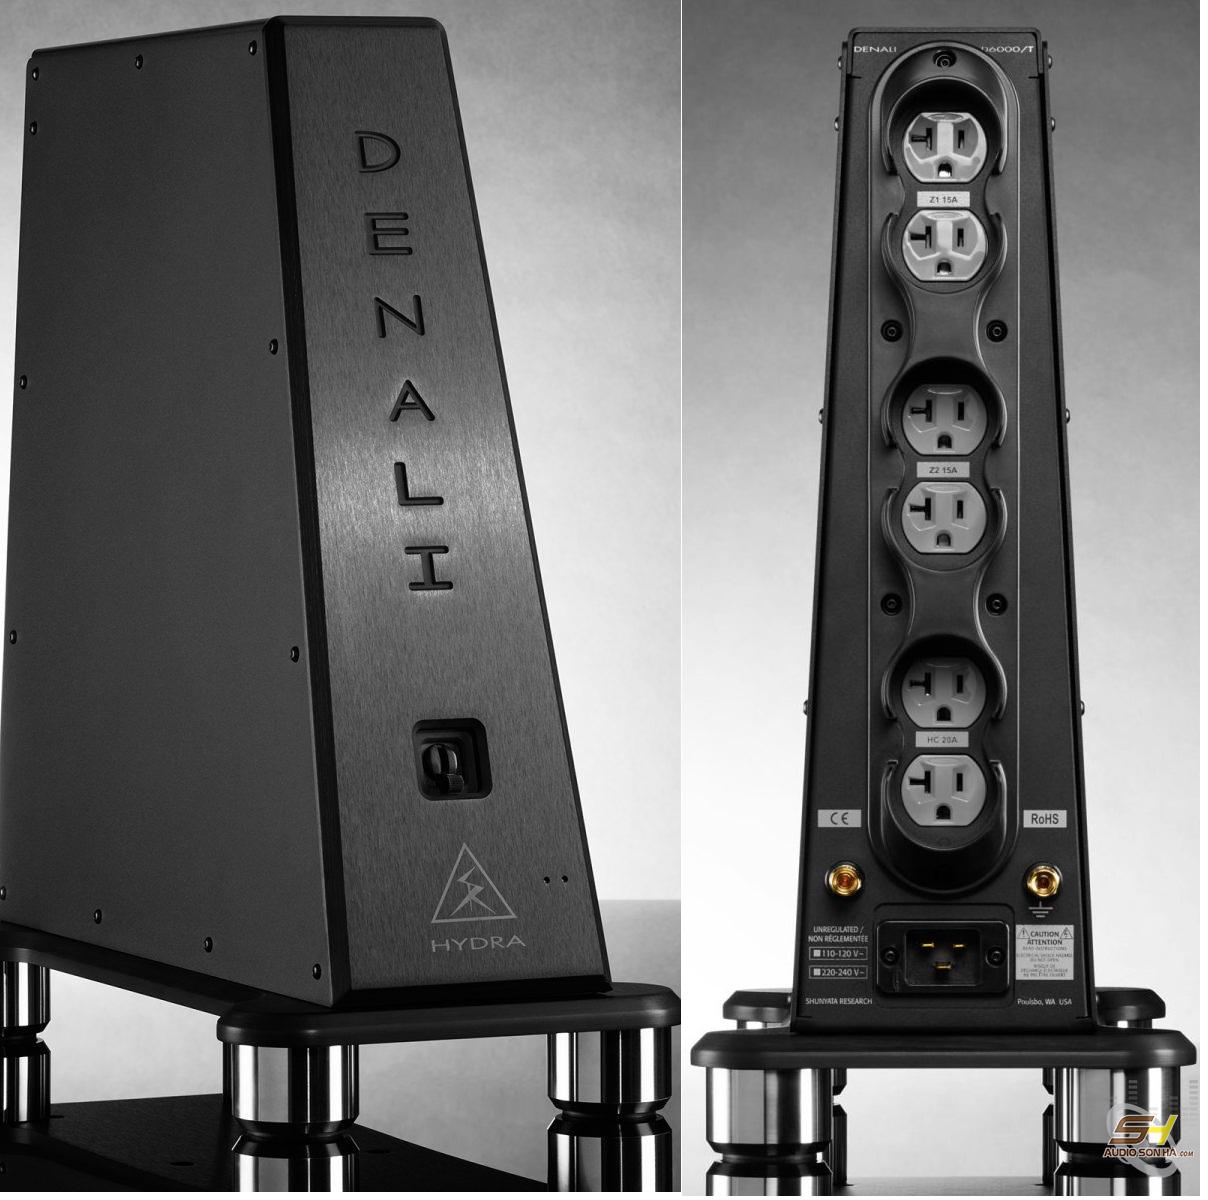 Shunyata DENALI D6000/T 240V 6 Outlet